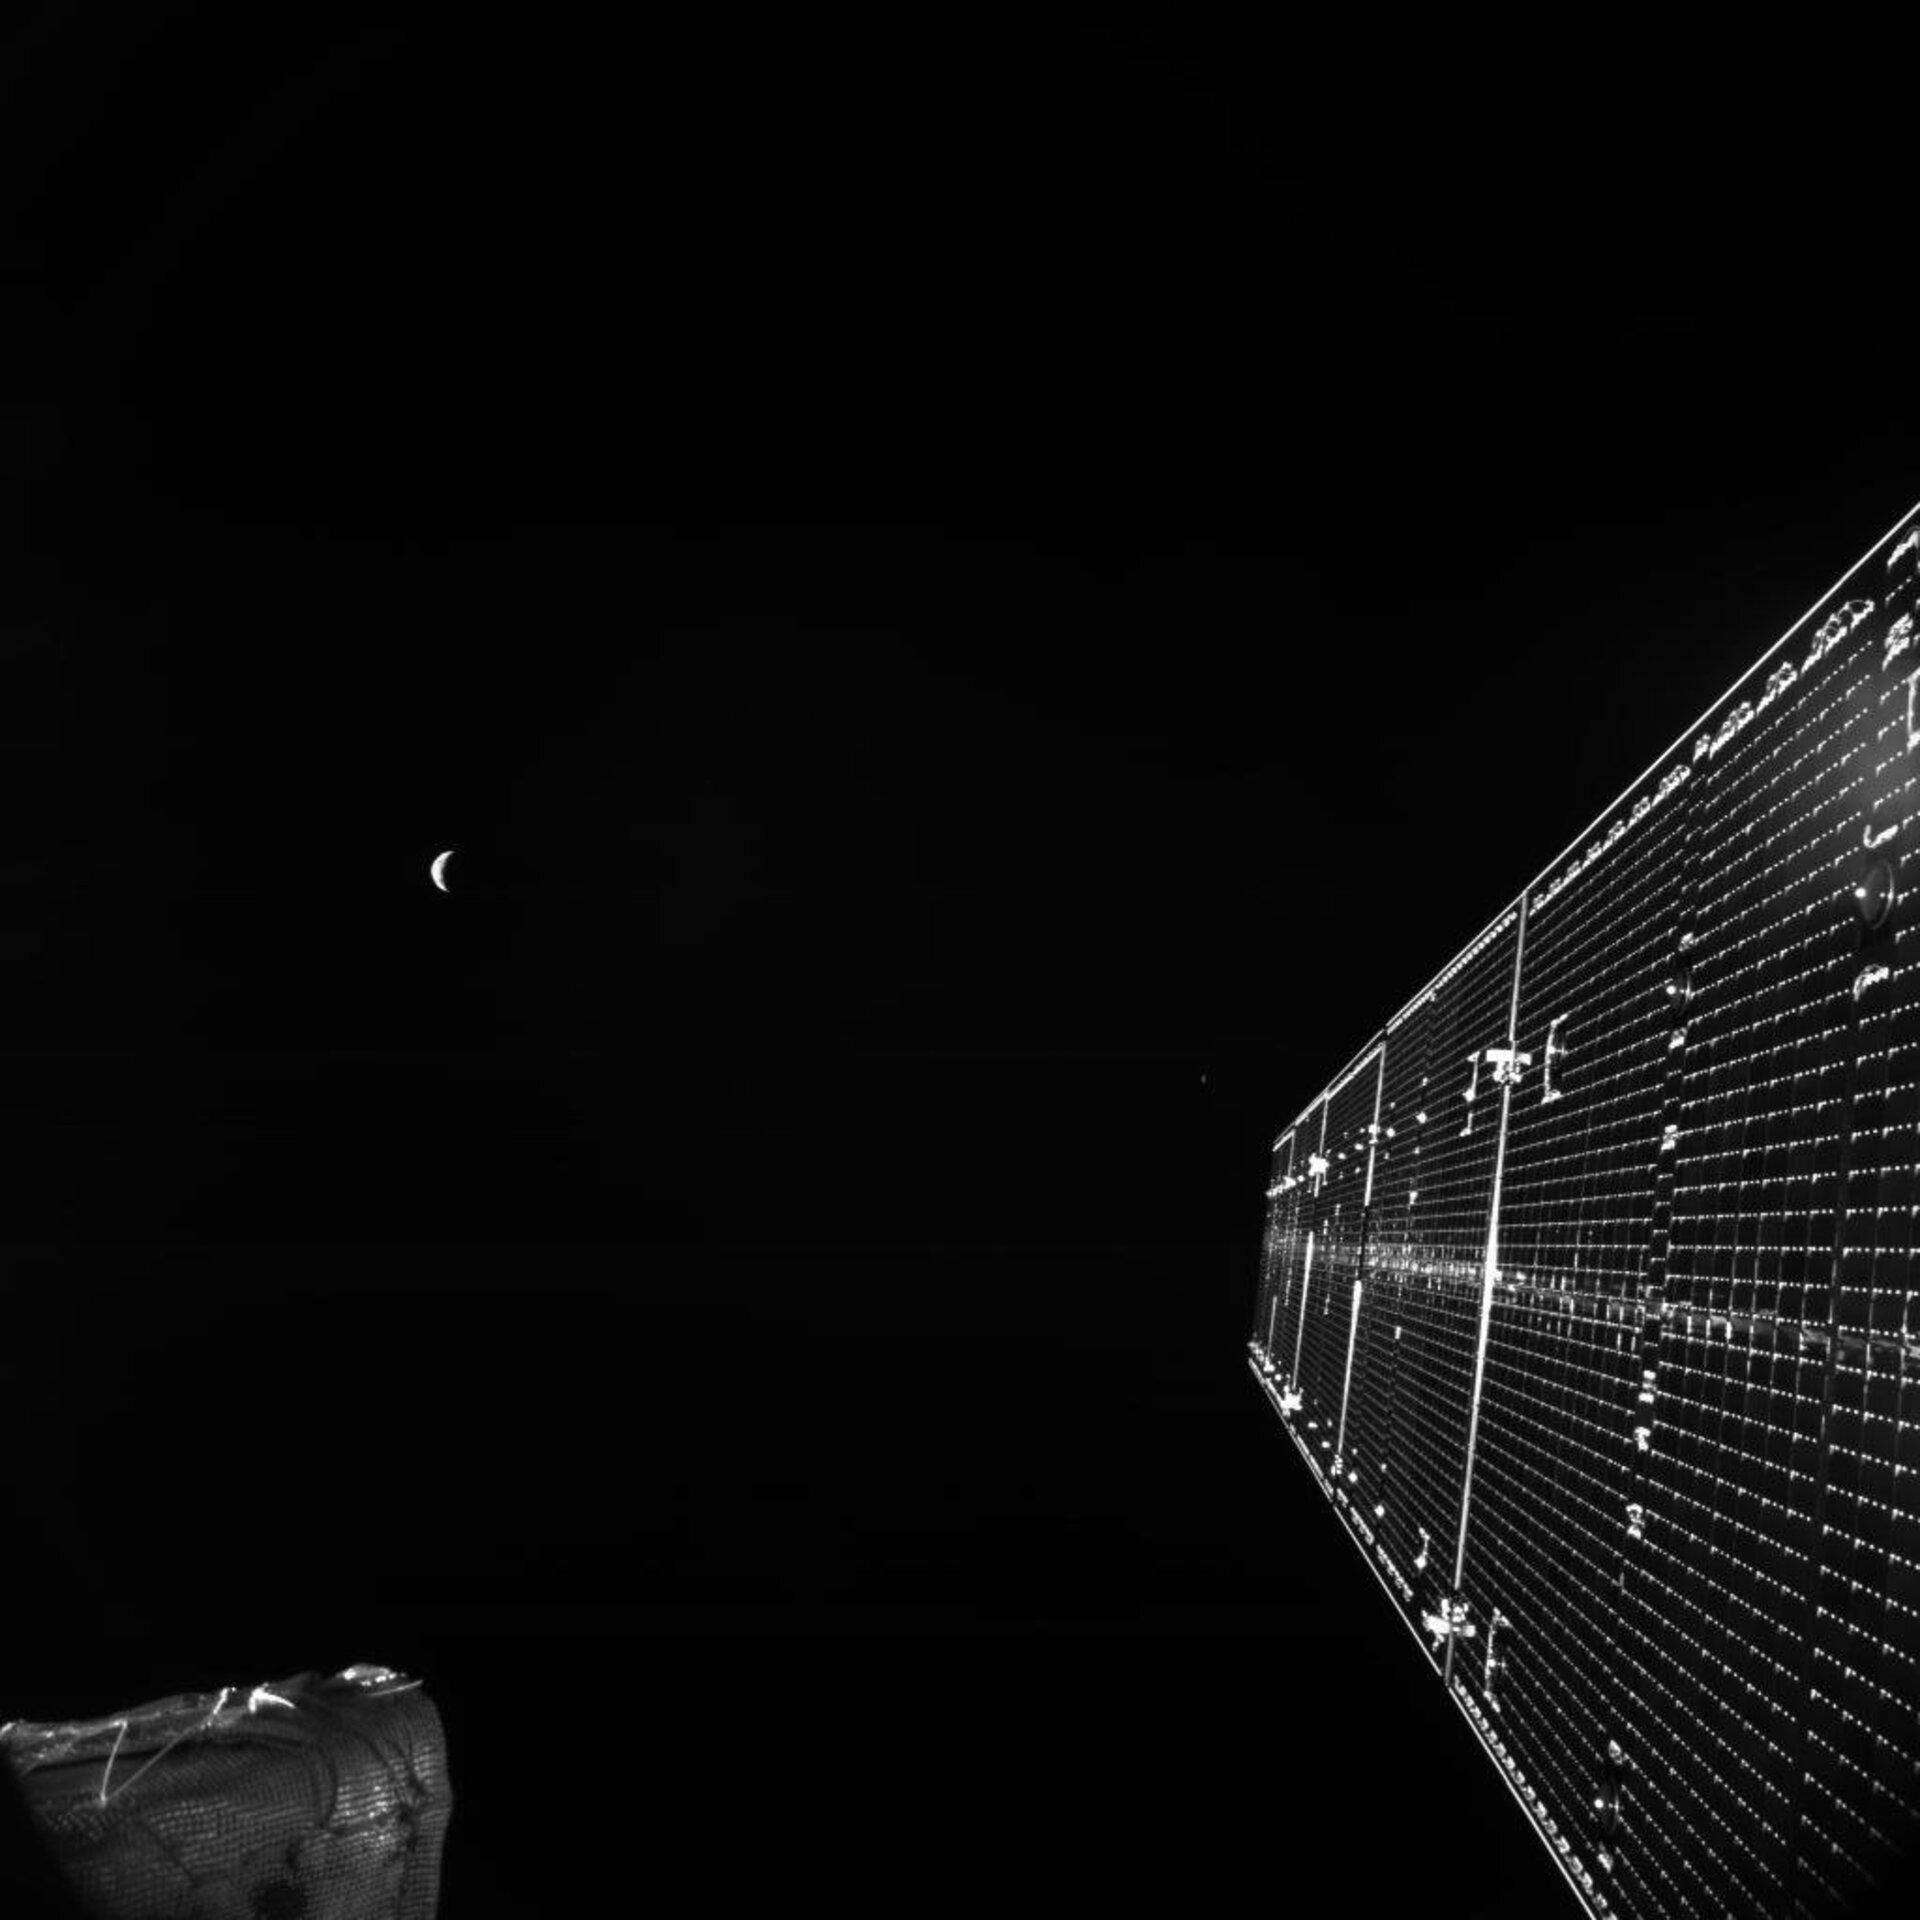 https://www.esa.int/var/esa/storage/images/esa_multimedia/images/2020/04/bepicolombo_bids_farewell_to_earth_and_the_moon/21943974-1-eng-GB/BepiColombo_bids_farewell_to_Earth_and_the_Moon_pillars.jpg